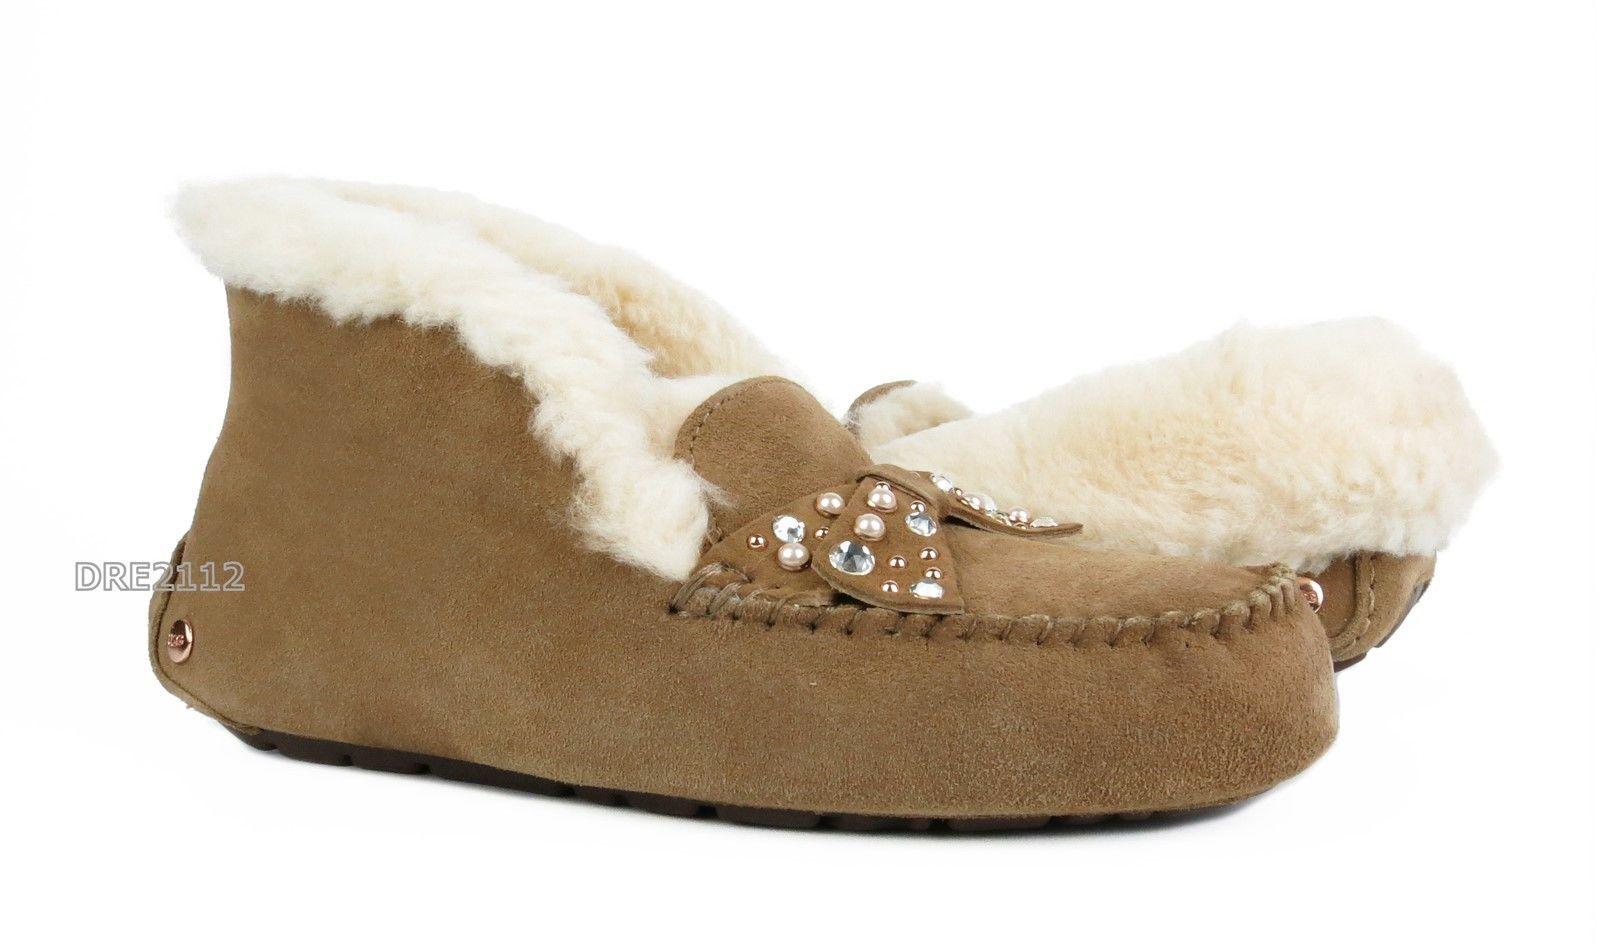 94 95 Ugg Alena Brilliant Chestnut Bling Fur Suede Slippers Womens Size 8 Nib